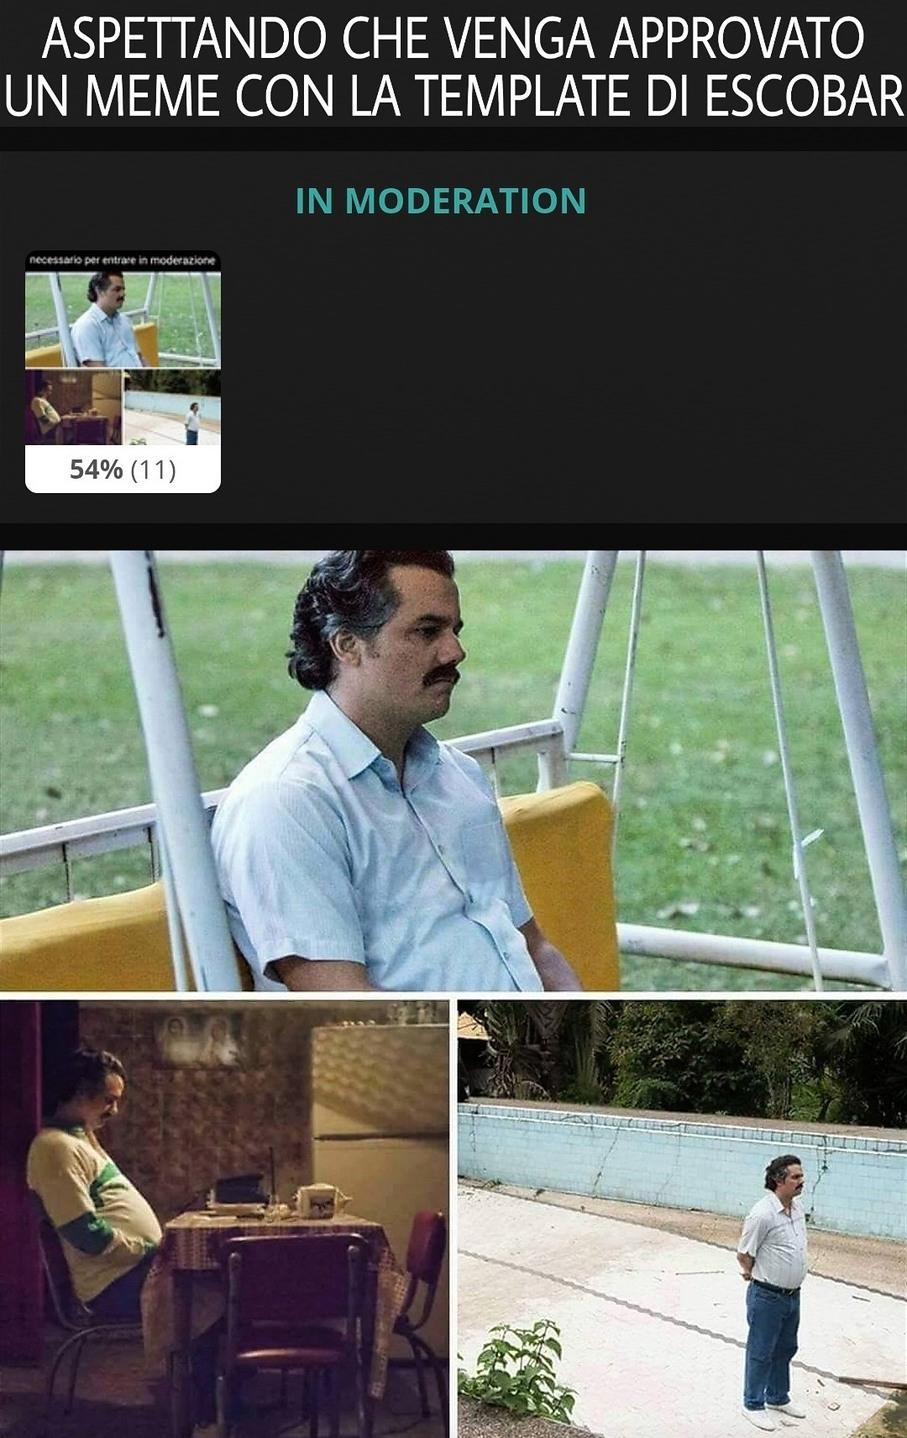 Lunga e speranzosa attesa - meme